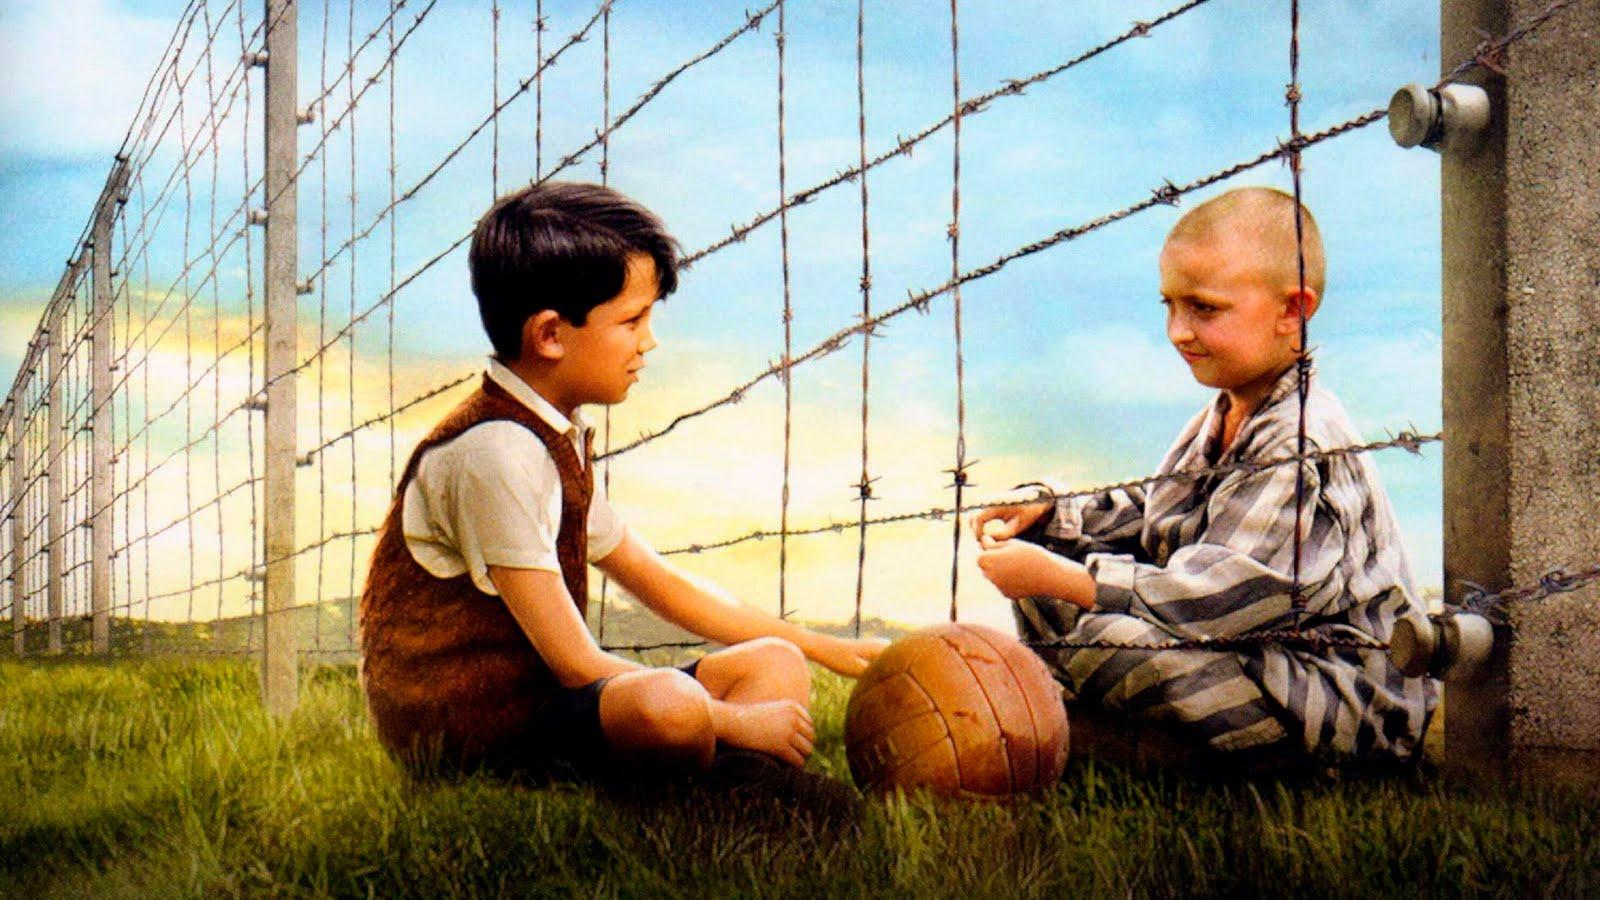 essay about the boy in striped pyjamas Category: john boyne, the boy in the striped pyjamas title: innocence in the boy in the striped pajamas by john boyne.